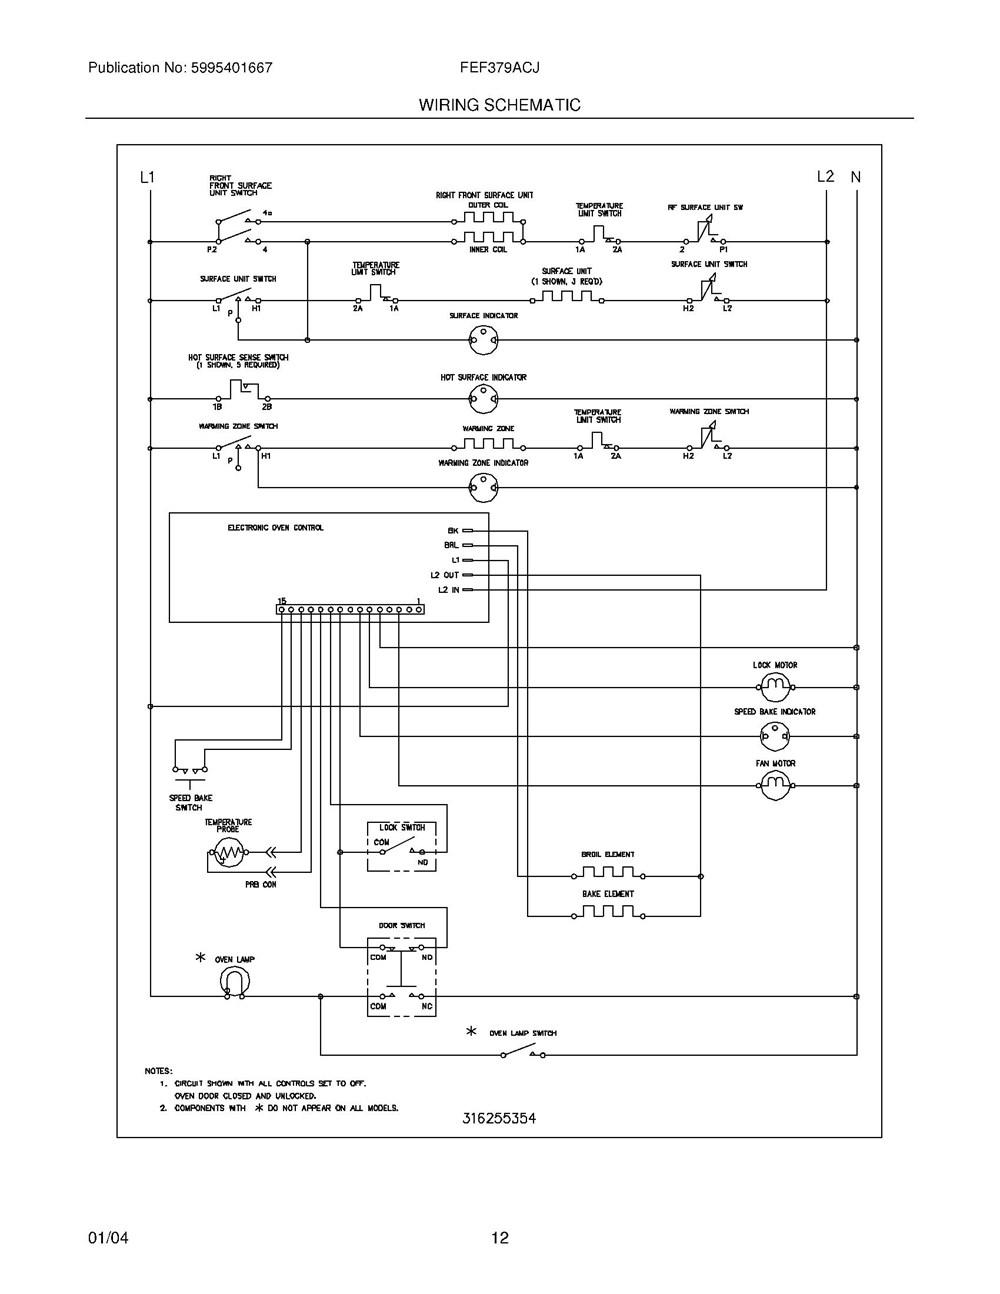 Fef379acj Frigidaire Company 07top Drawer 09door 01cover 10wiring Diagram 11wiring